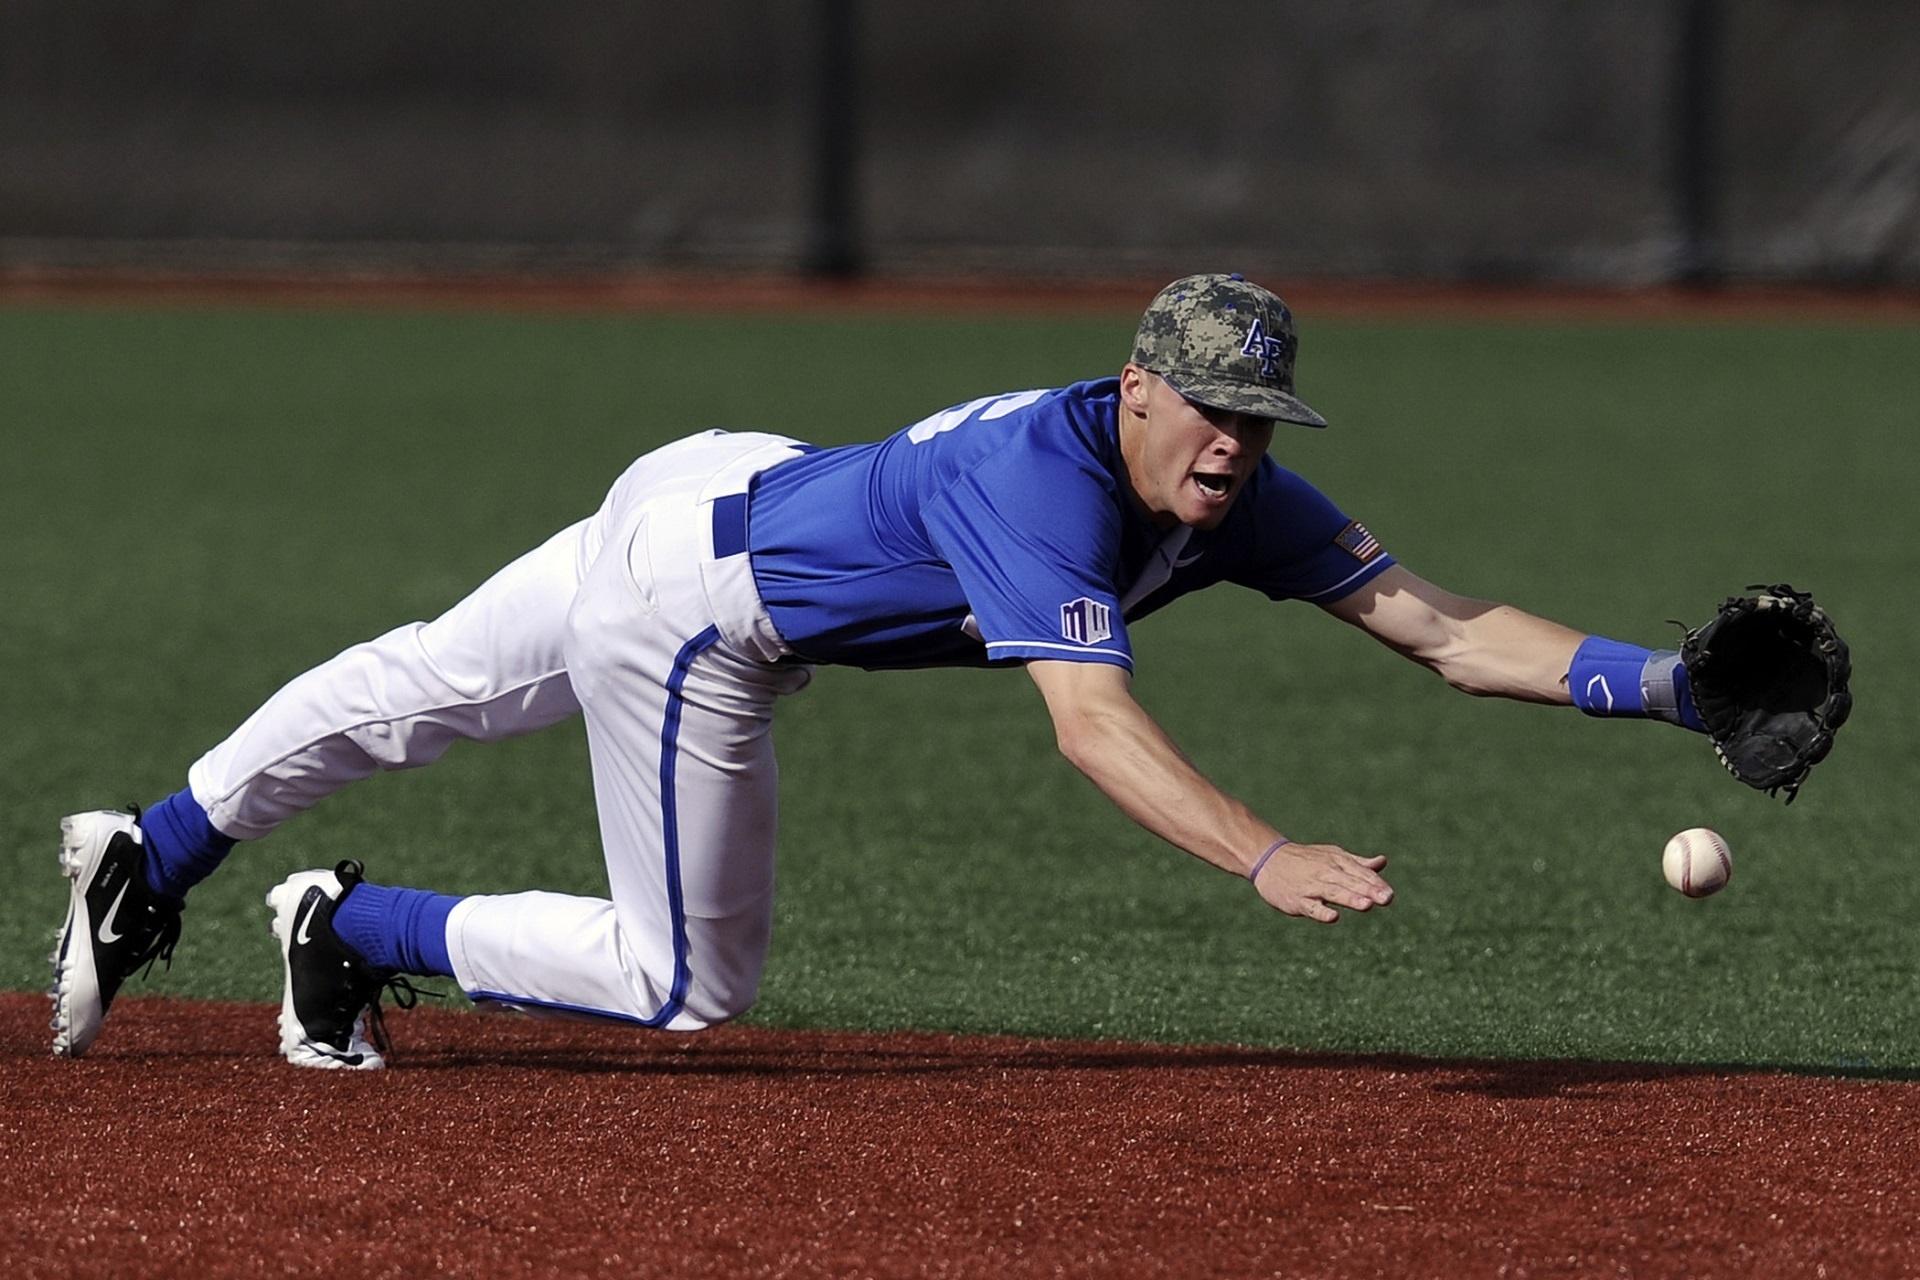 Baseball player catching the ball